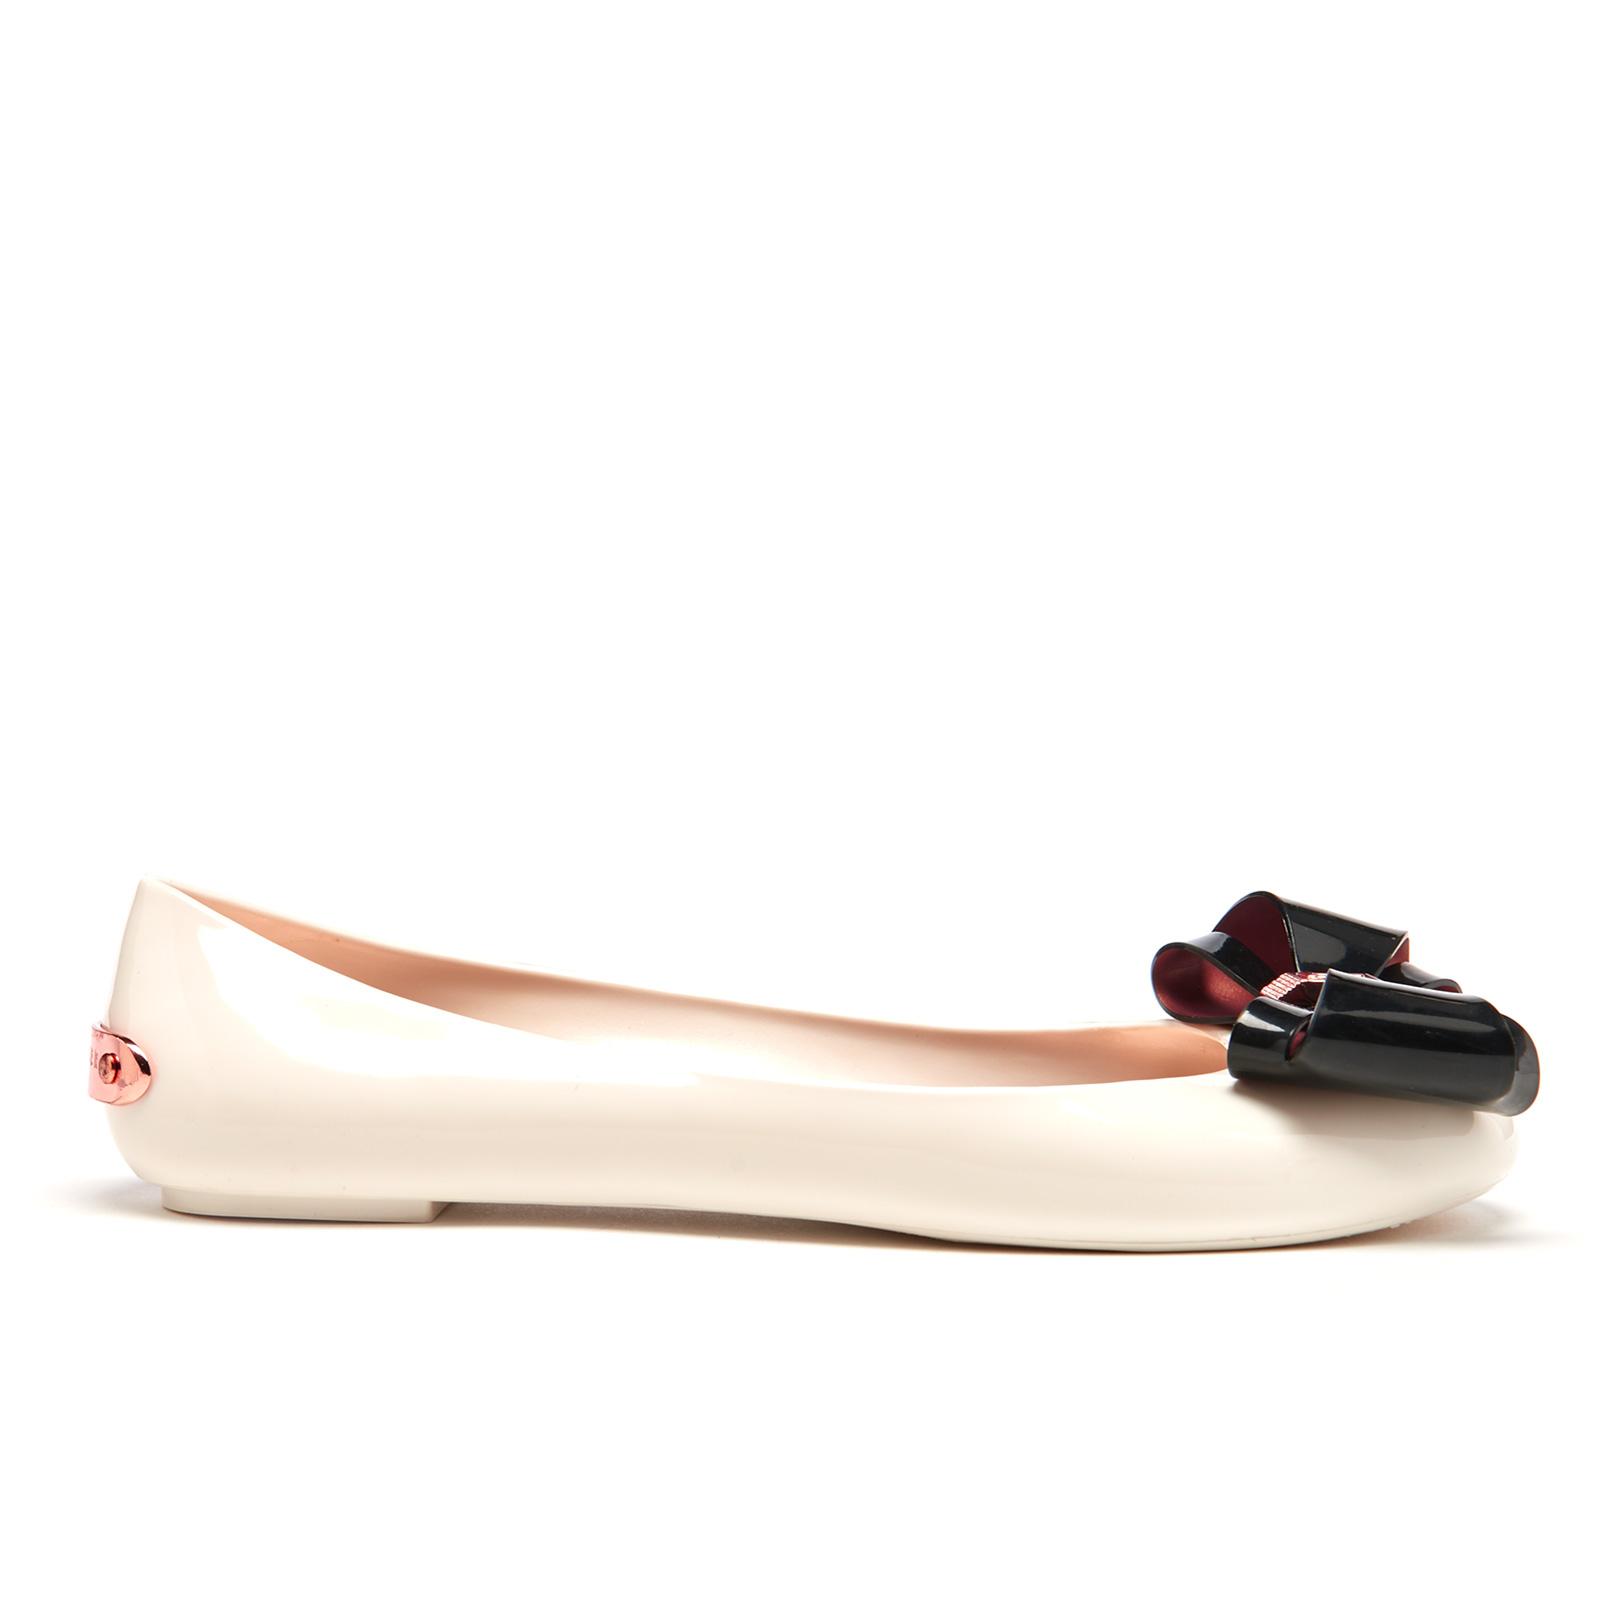 07452d50a Ted Baker Women's Julivia Bow Front Ballet Pumps - Cream/Black   FREE UK  Delivery   Allsole